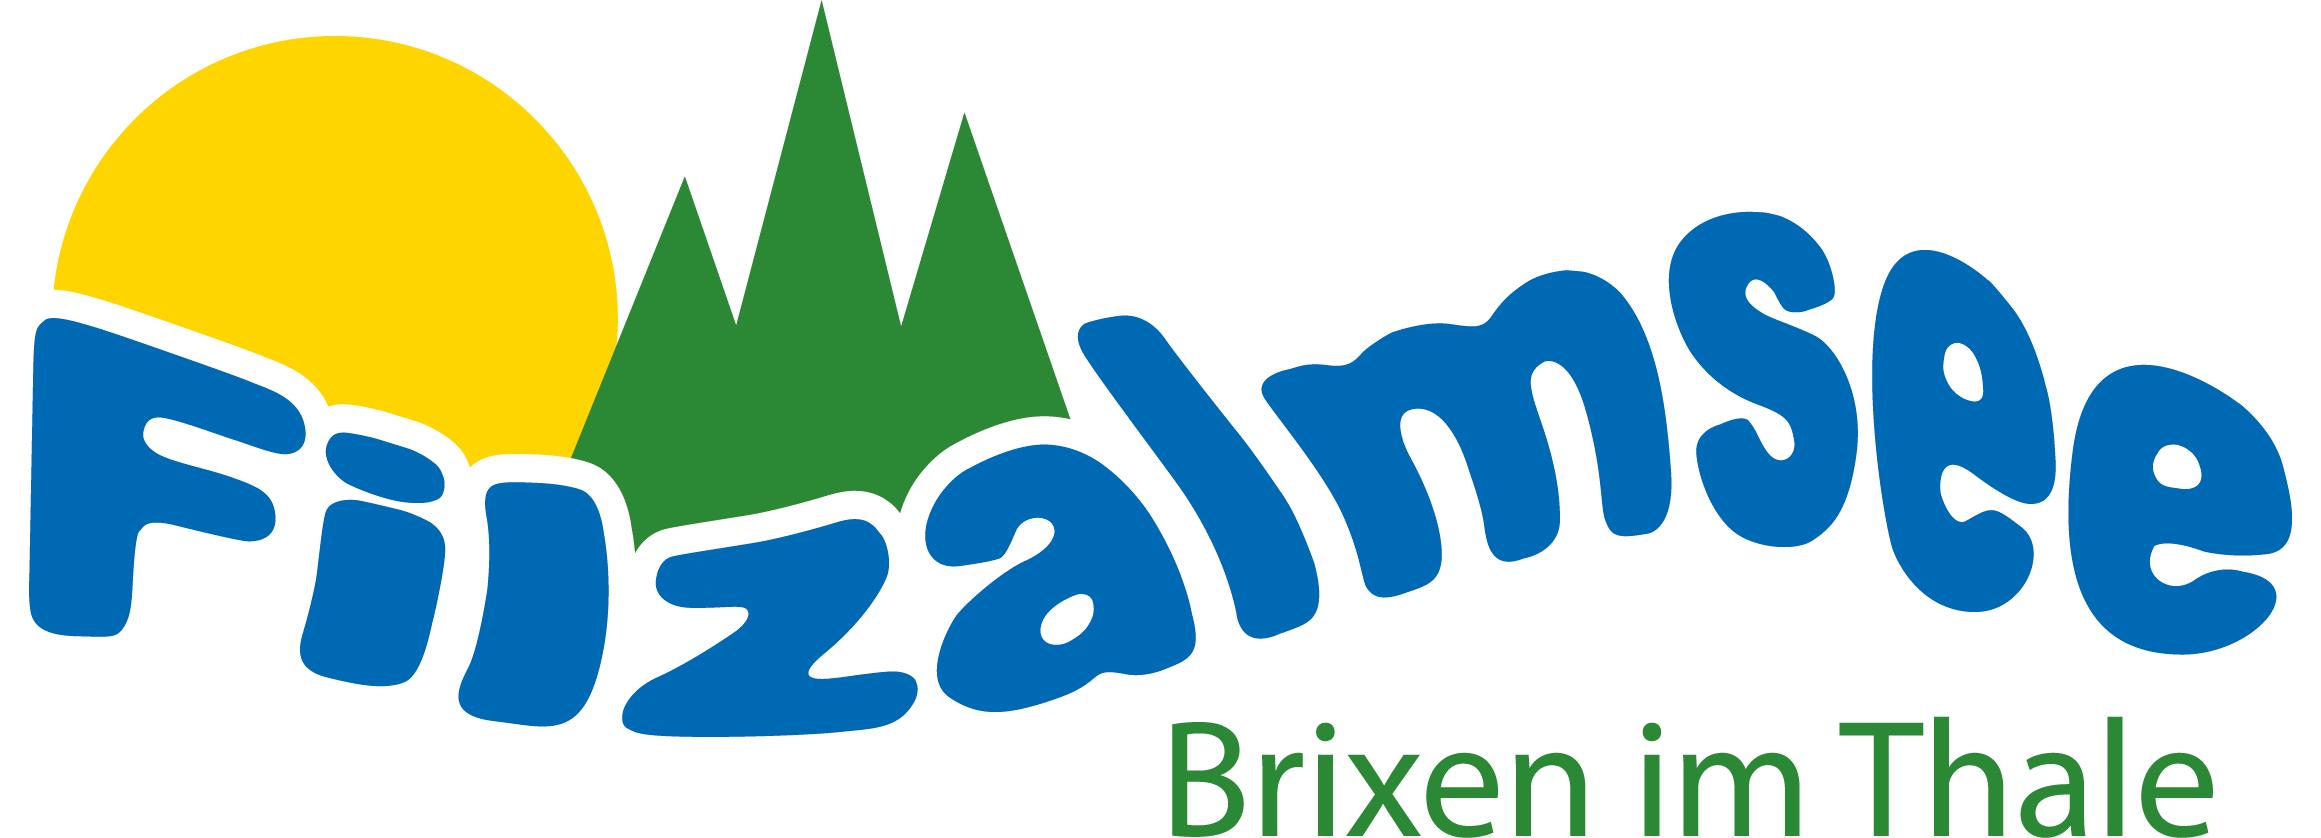 Filzalmsee